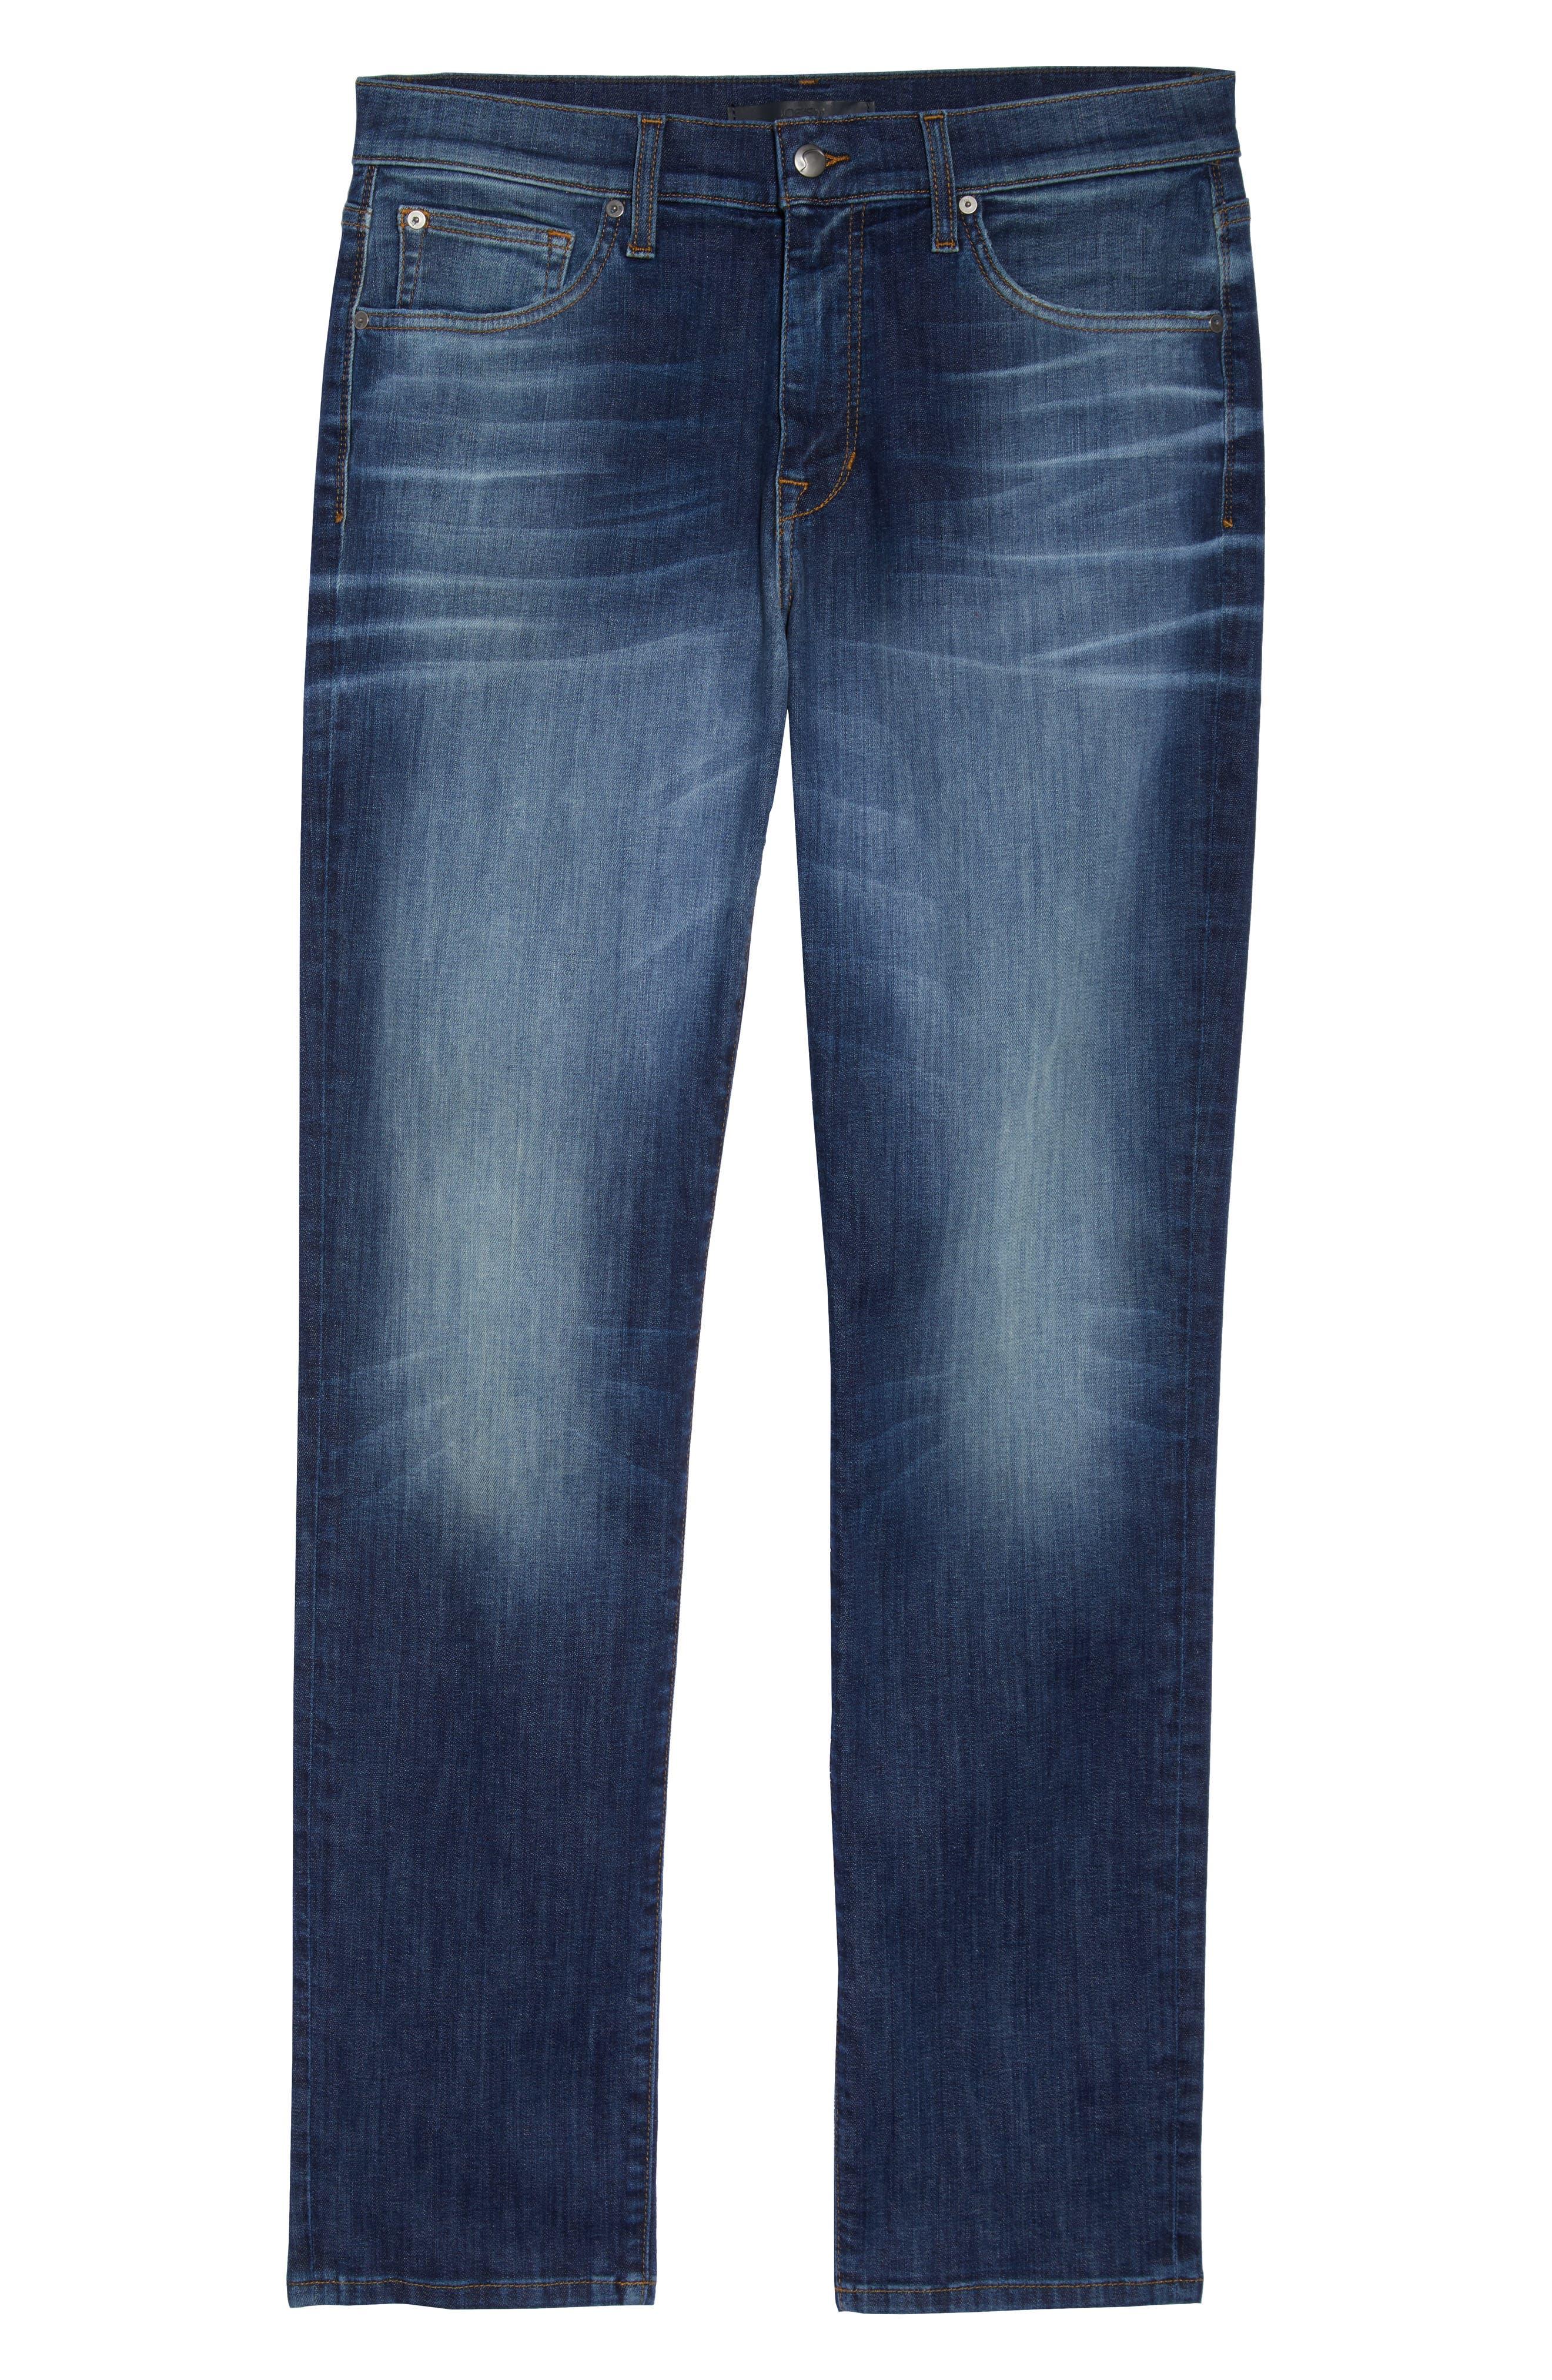 JOE'S,                             Brixton Slim Straight Leg Jeans,                             Alternate thumbnail 4, color,                             HOYT